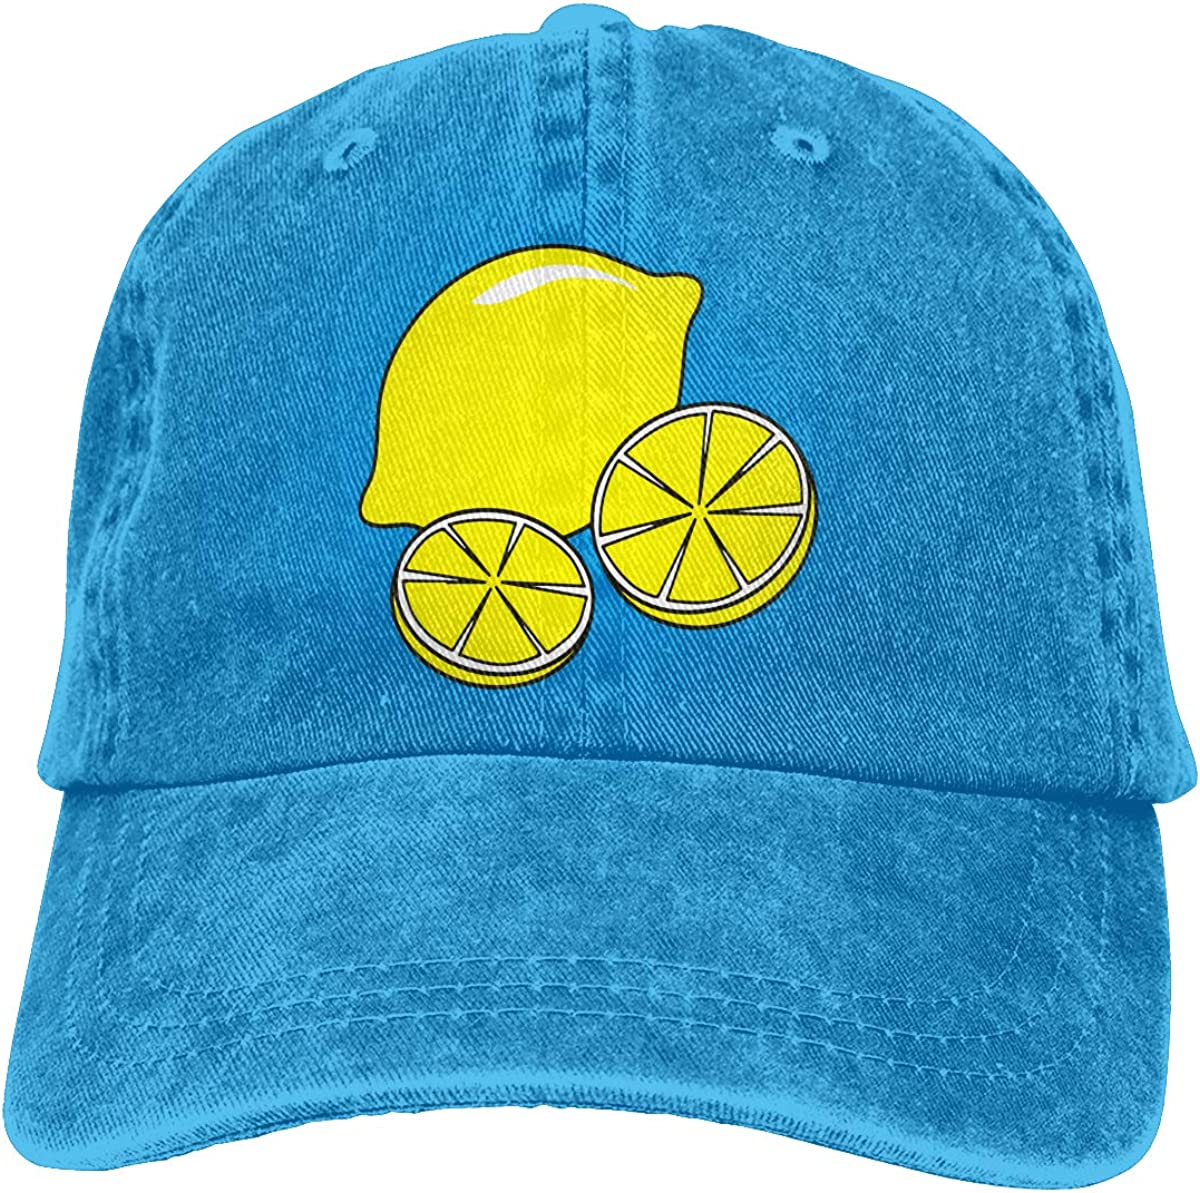 Q89 Lemon Unisex Trendy Cowboy Outdoor Sports Hat Adjustable Baseball Cap